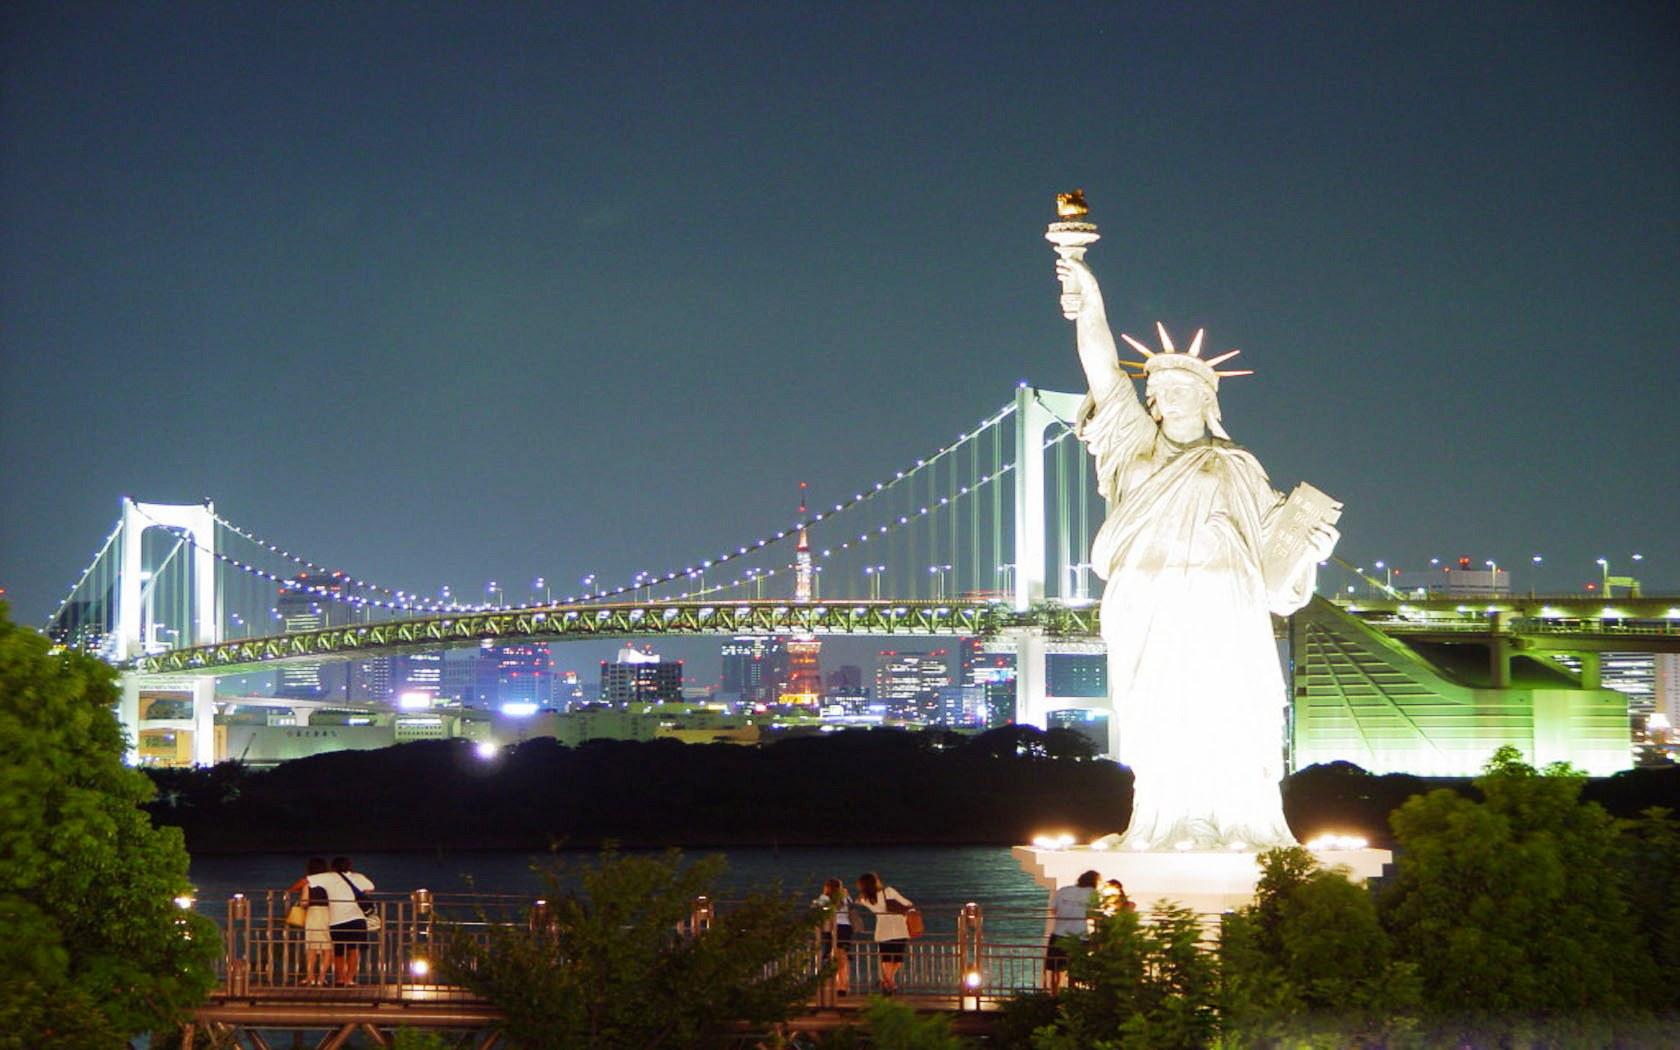 Statue Of Liberty Brooklyn Bridge Wallpaper   Travel HD Wallpapers 1680x1050